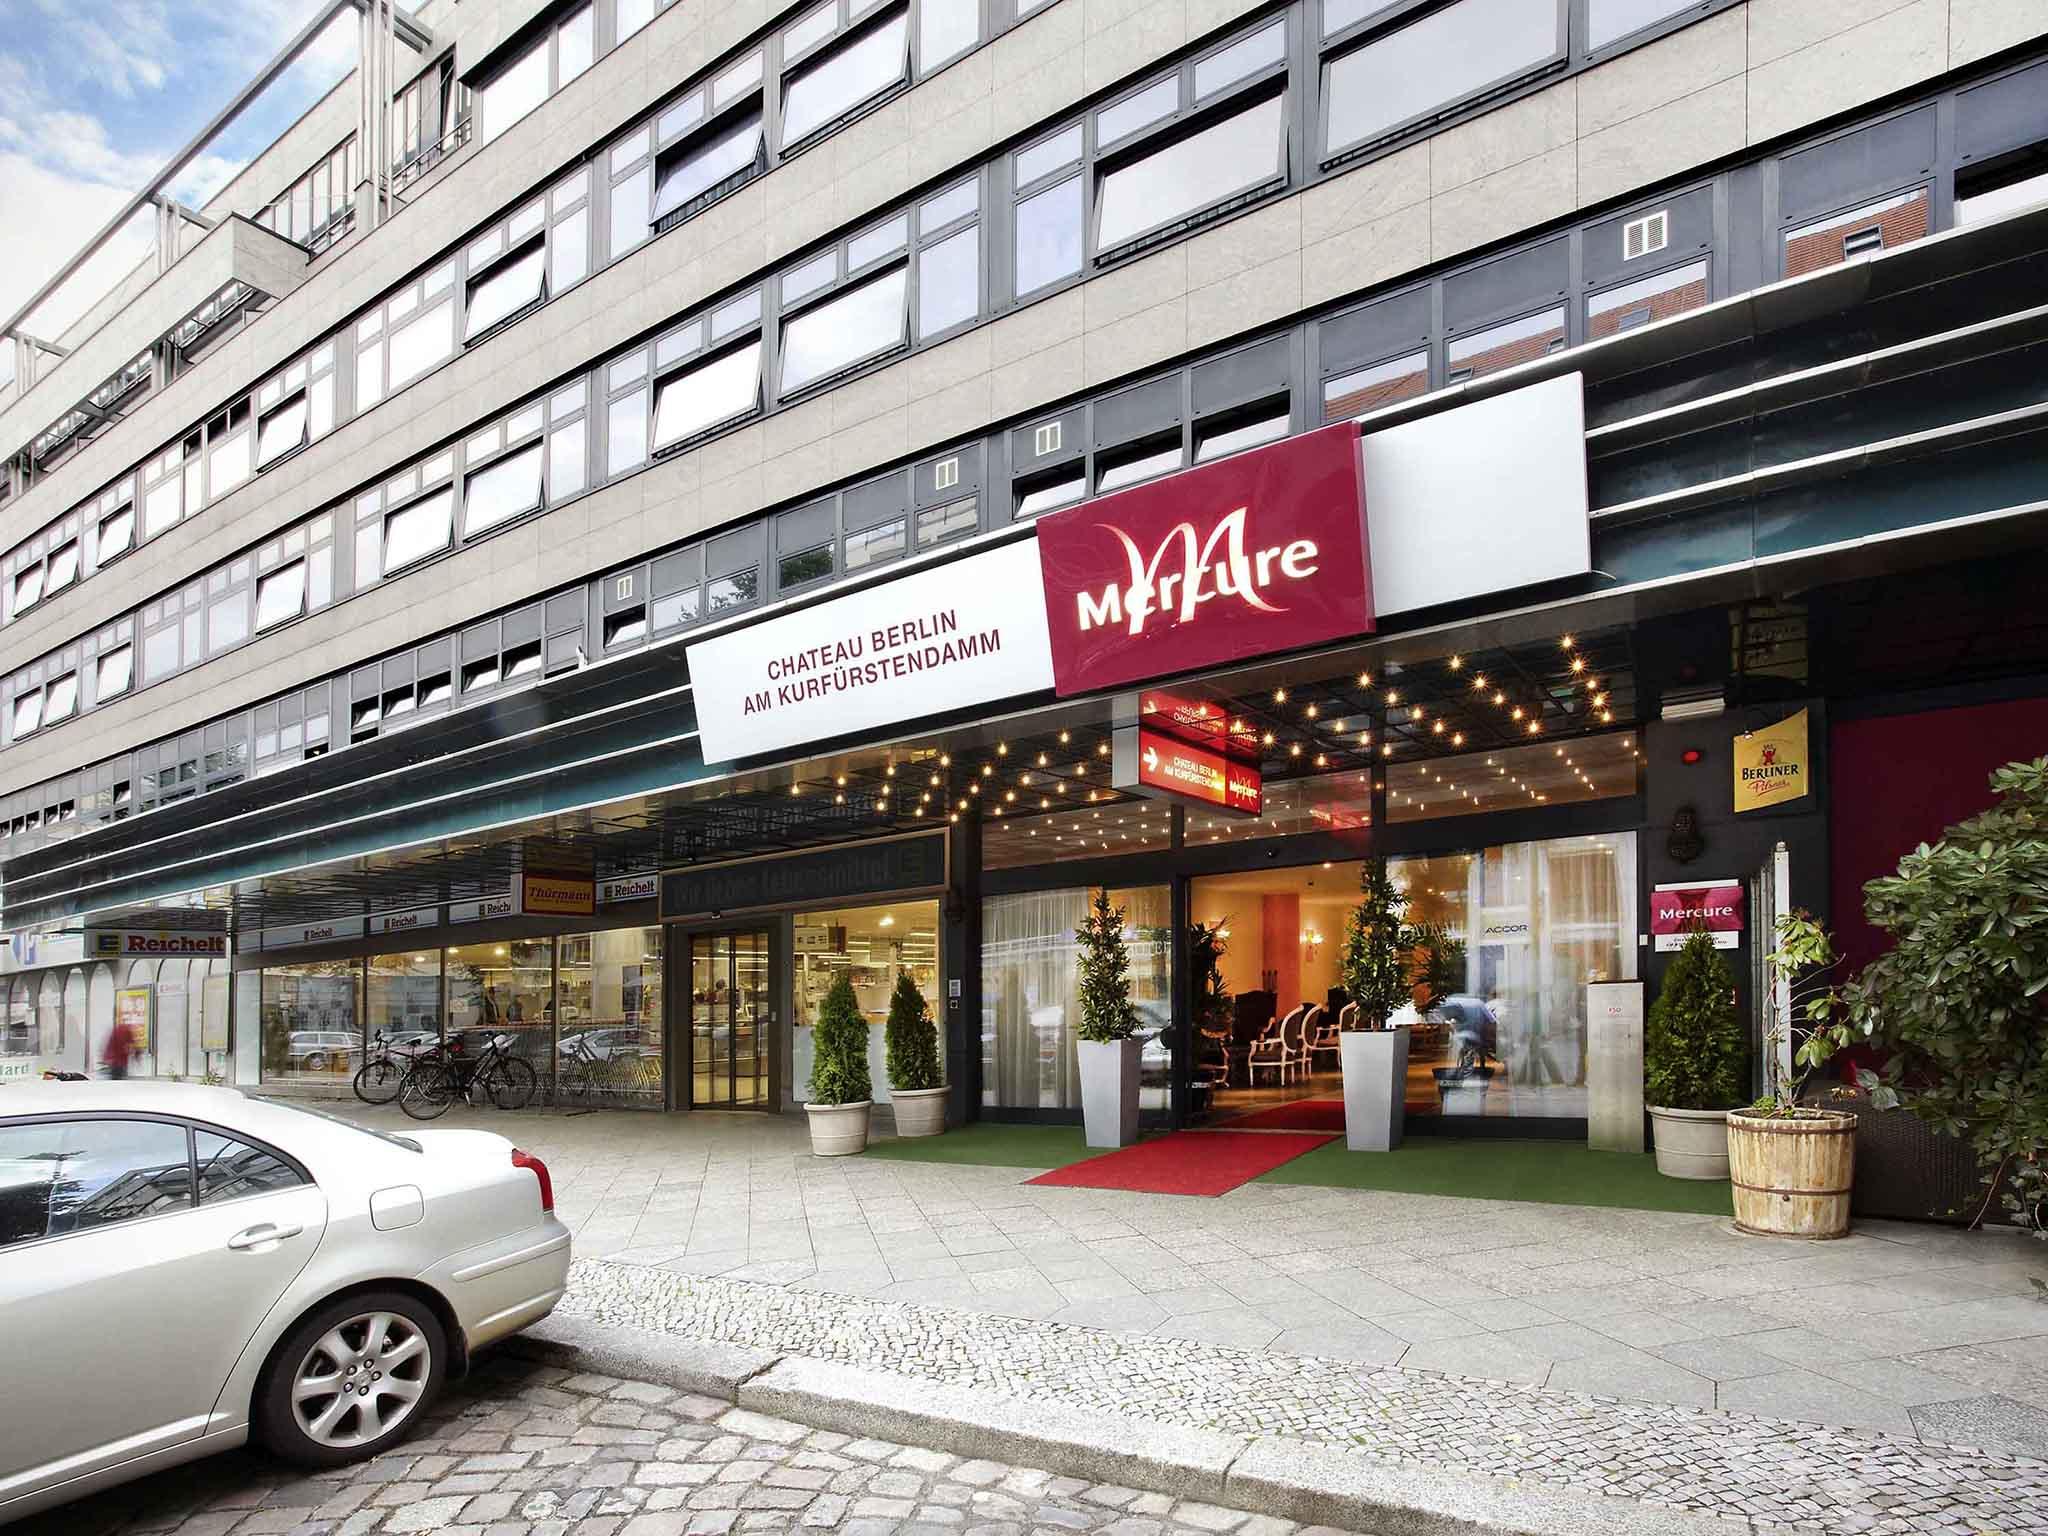 Hôtel - Mercure Hotel Chateau Berlin am Kurfuerstendamm